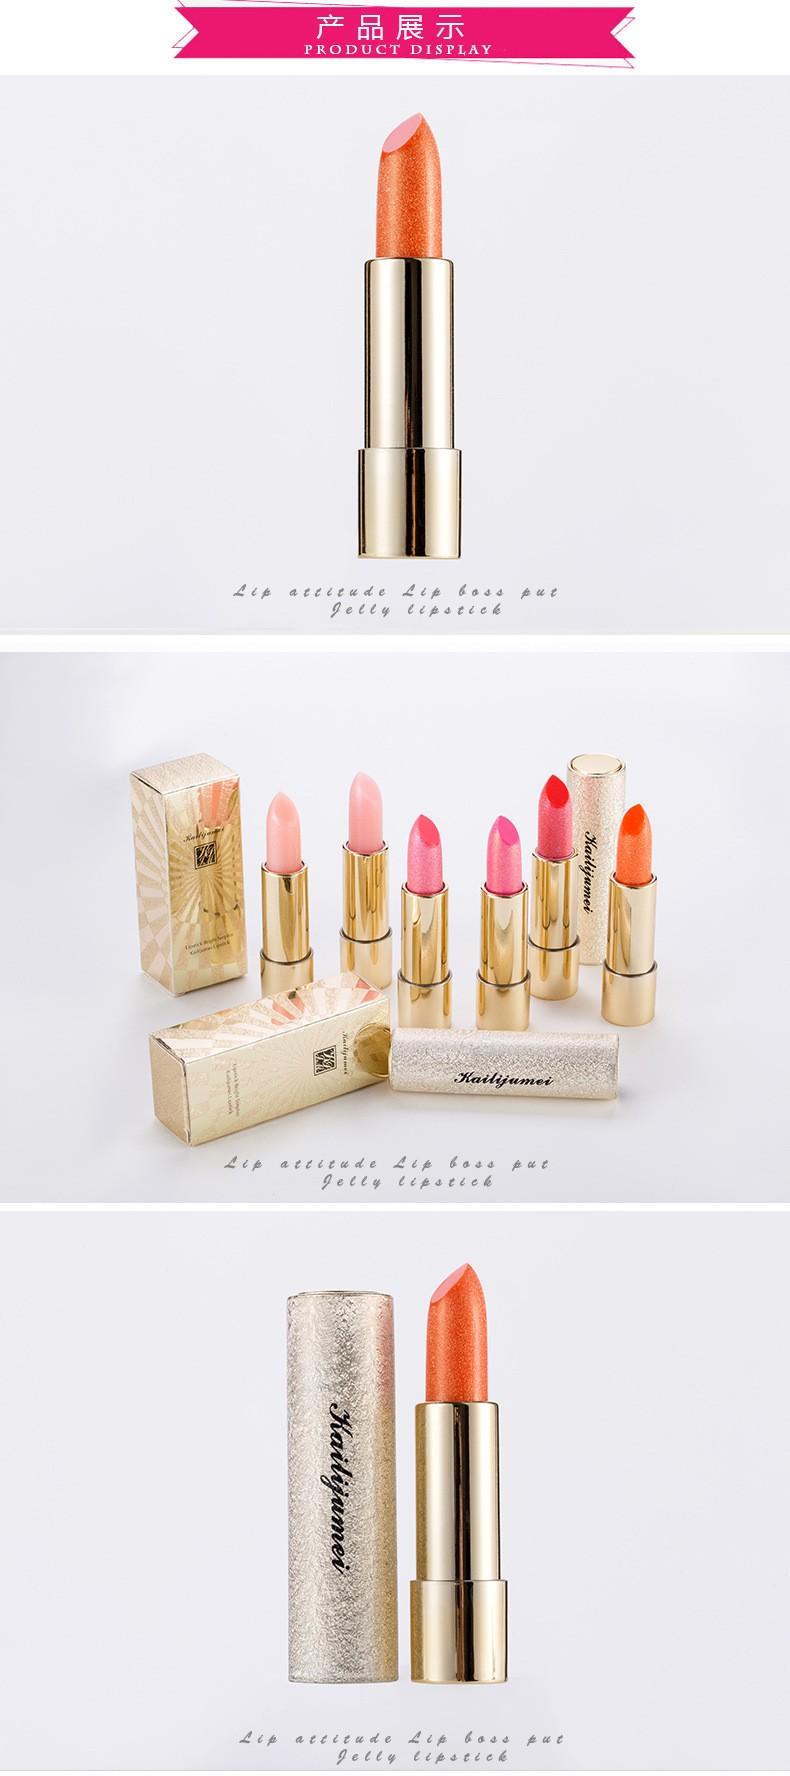 Kailijumei Newest Magic Color Temperature Change Lip Balm Lipstick Ready Stock 20161115 112002 000 001 002 003 004 005 006